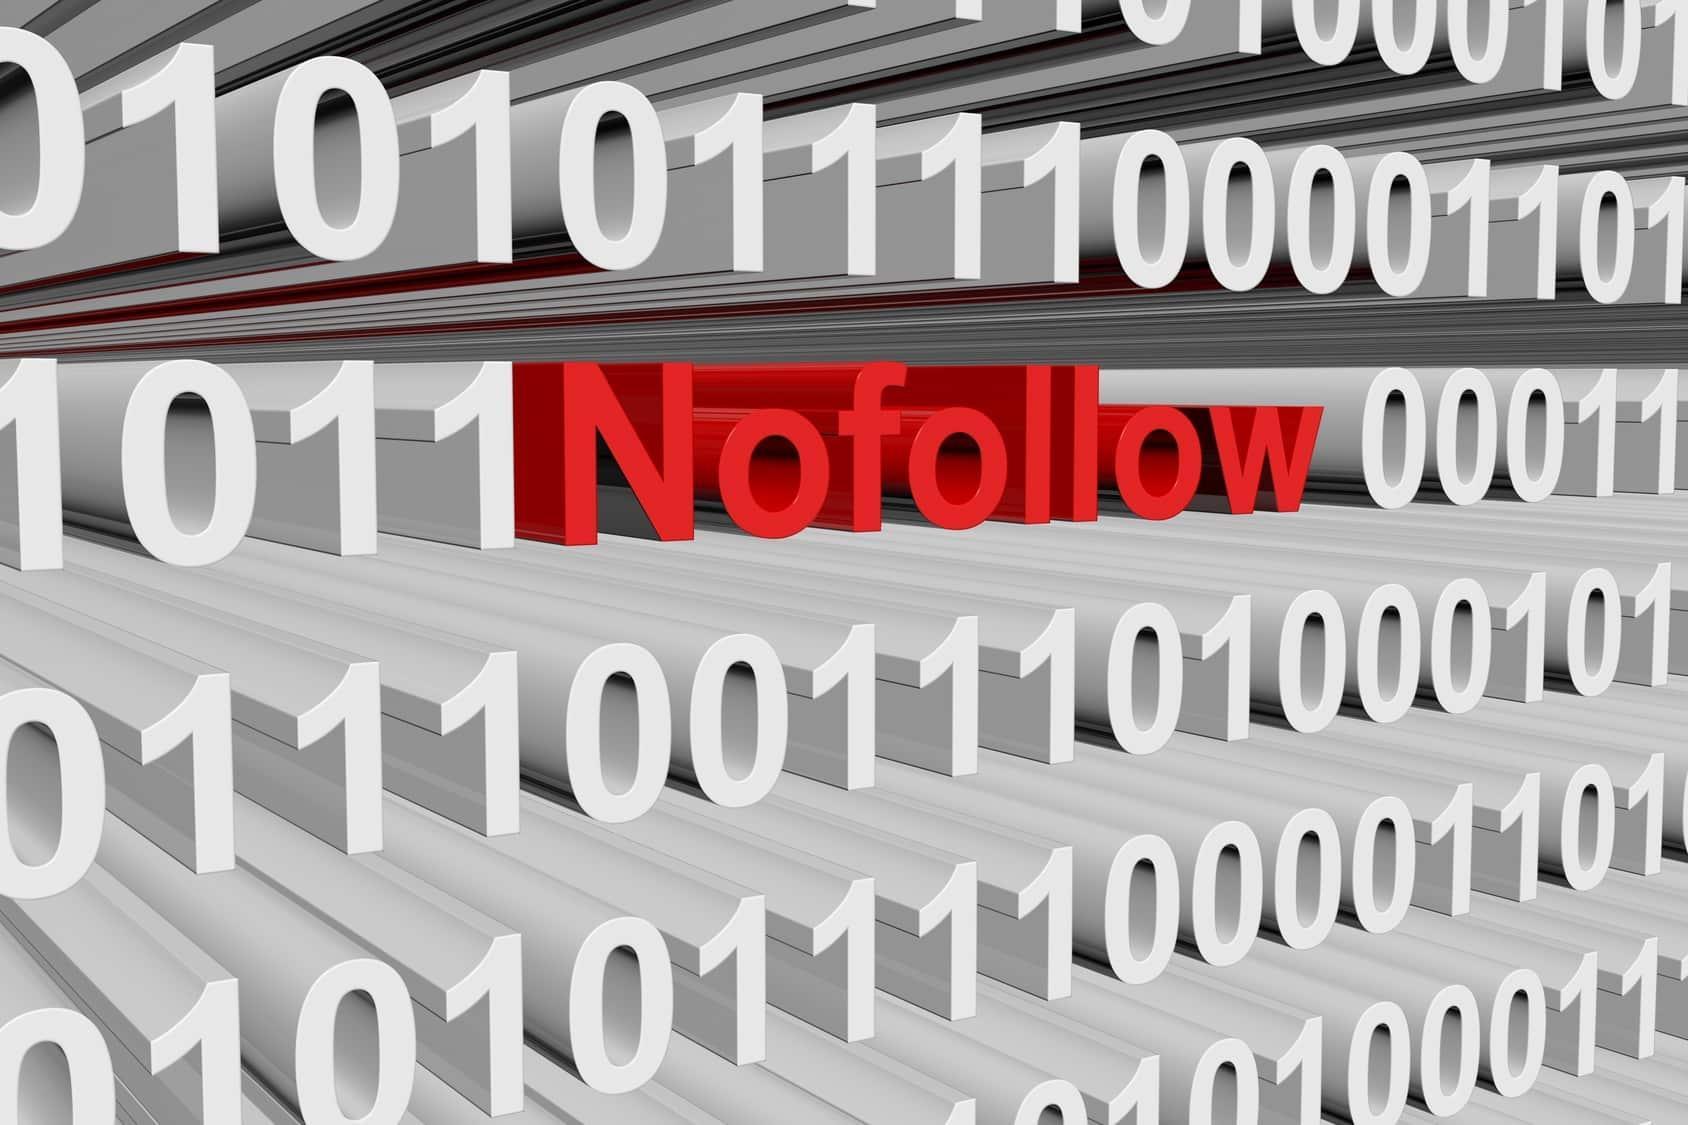 Dofollow und Nofollow